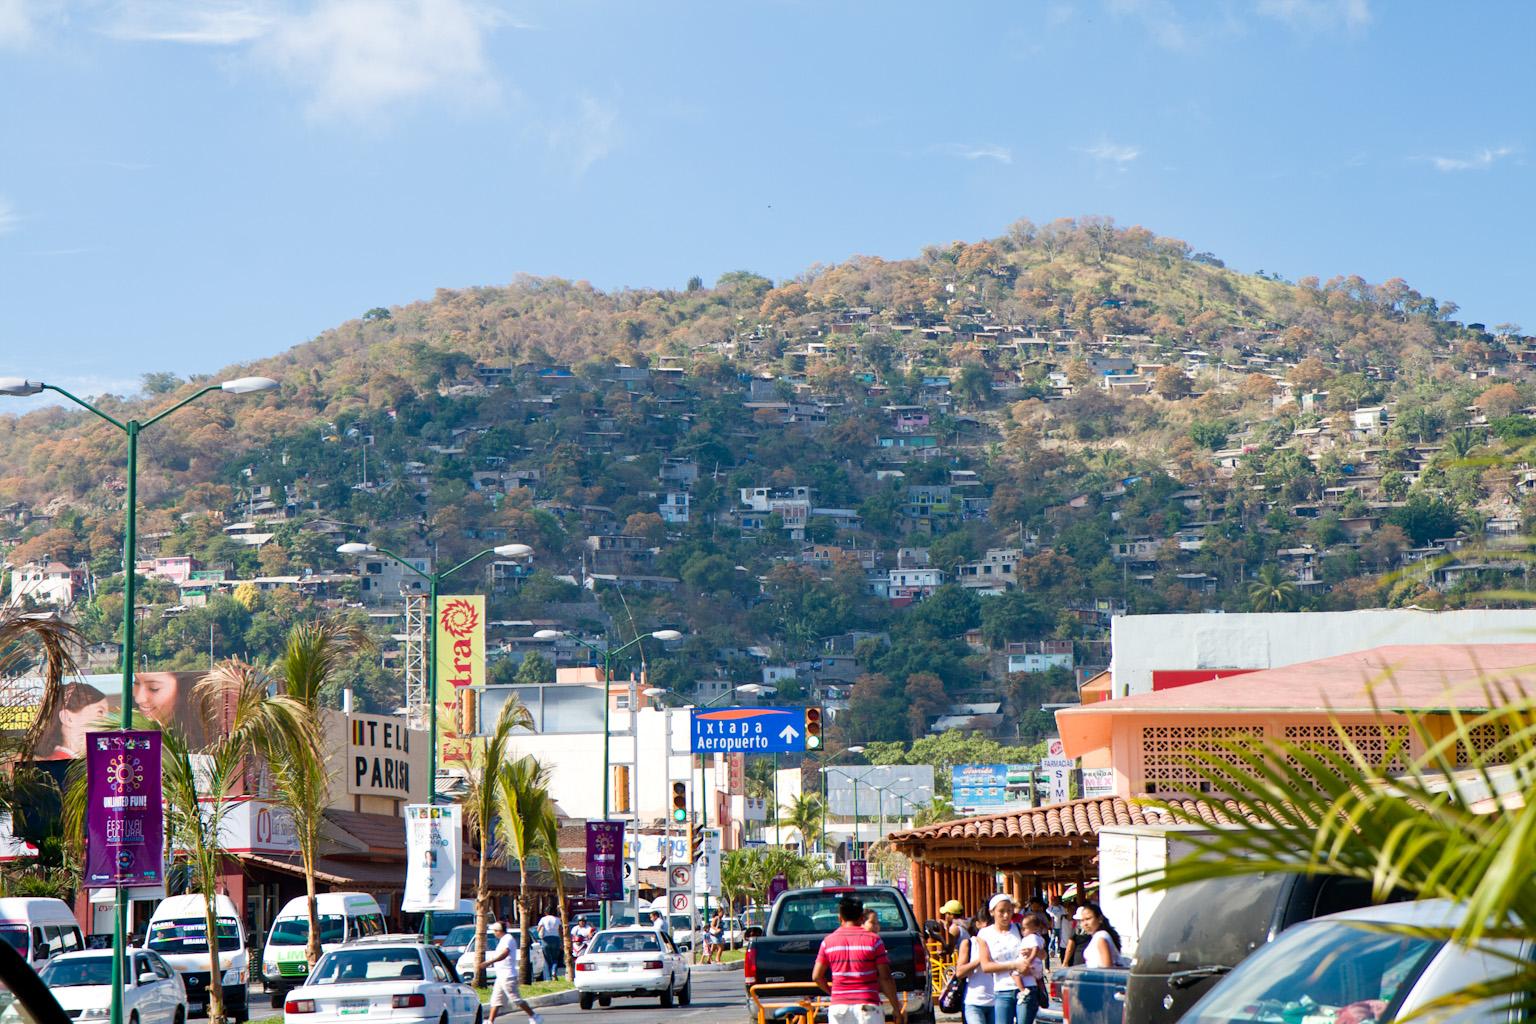 street view of hills